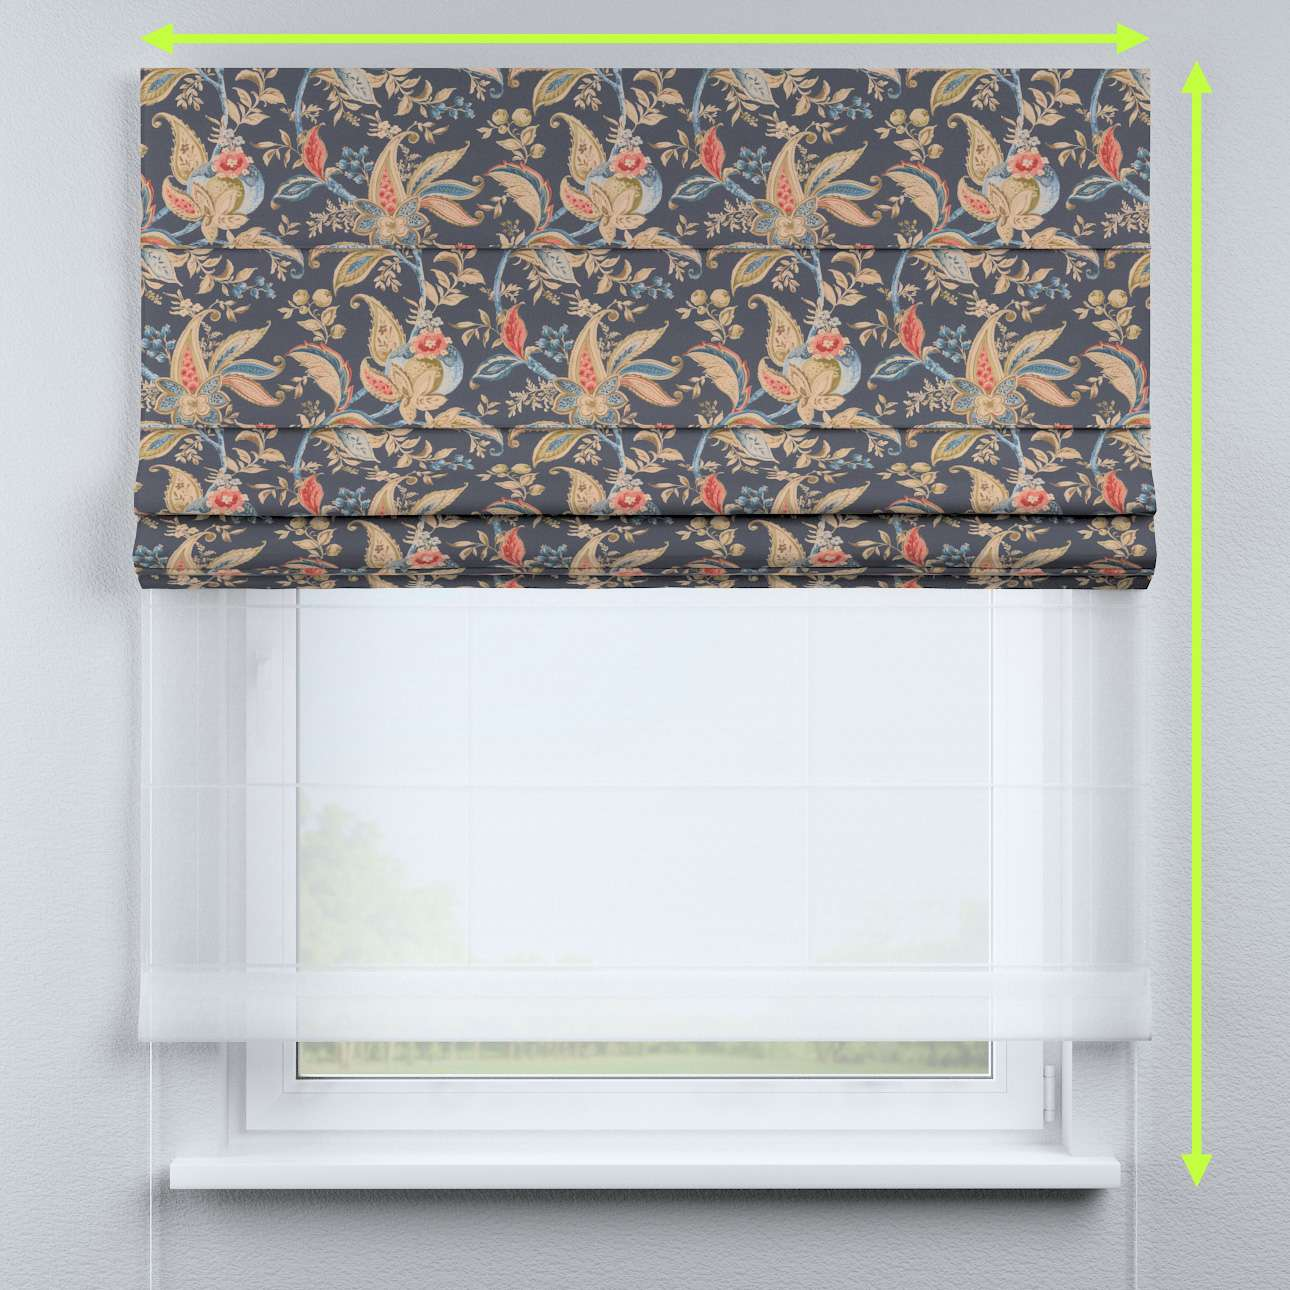 Rímska DUO roleta II V kolekcii Gardenia, tkanina: 142-19